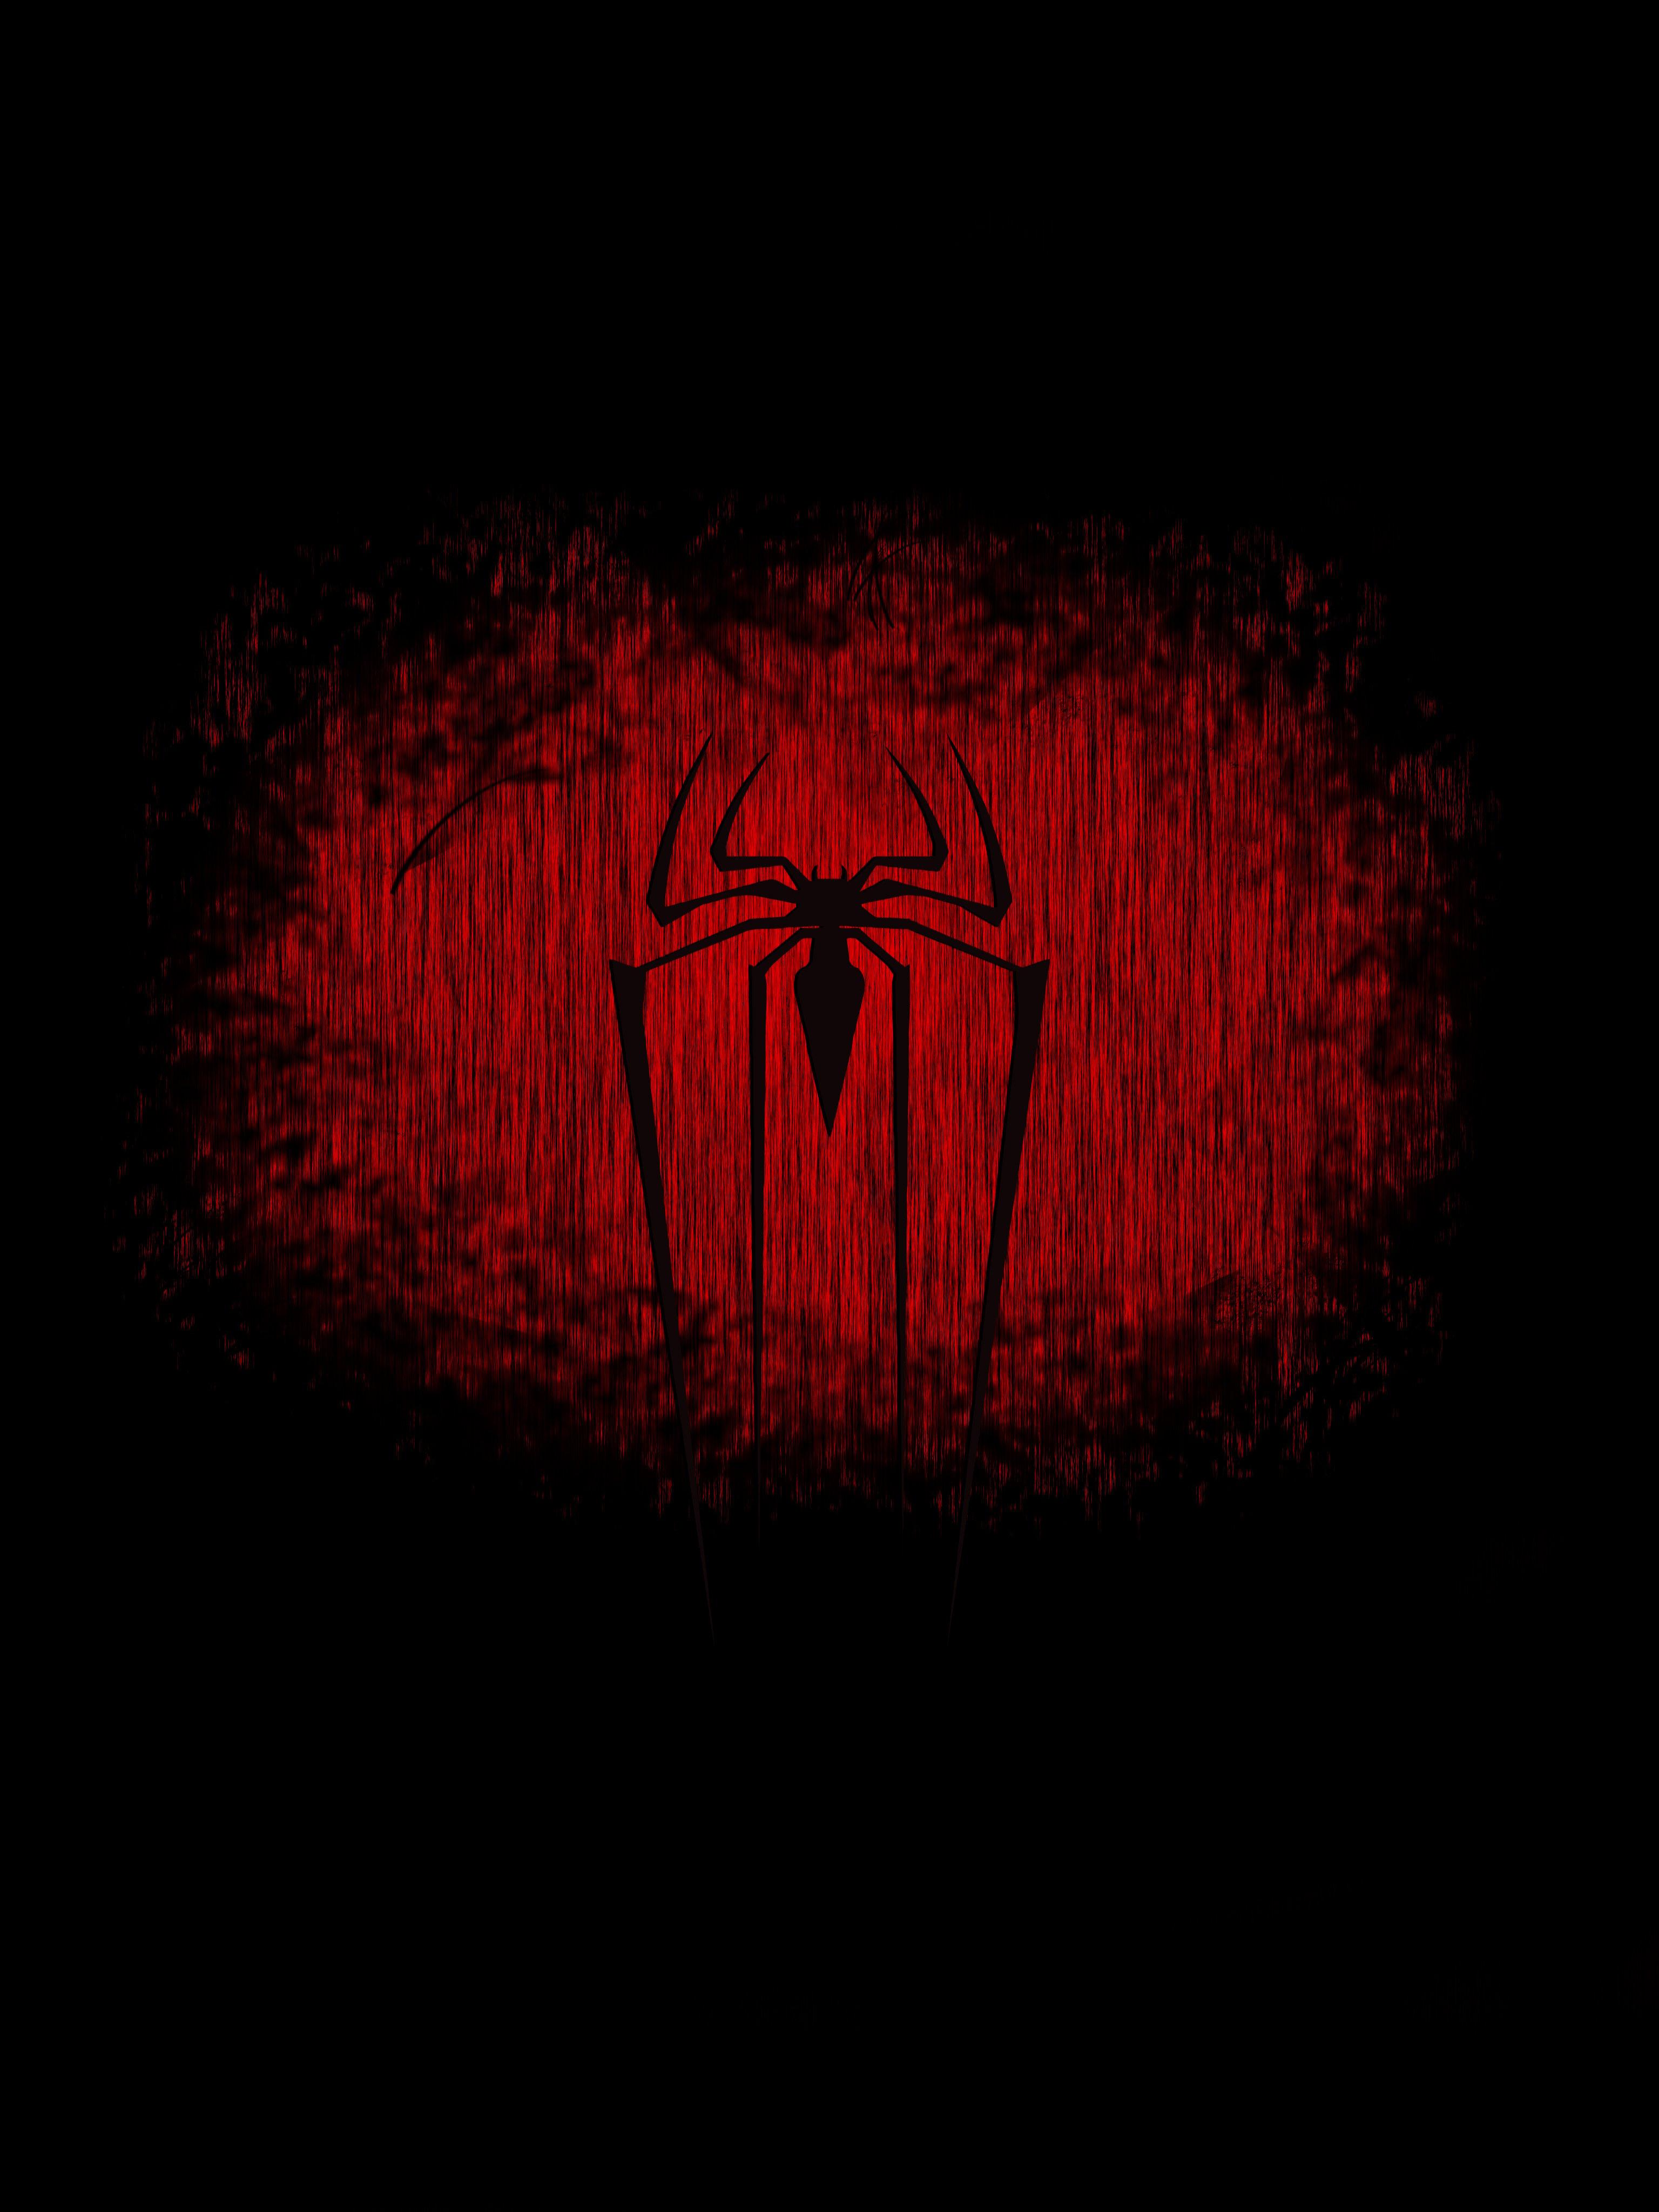 Amazing Spider Man Logo Wallpaper